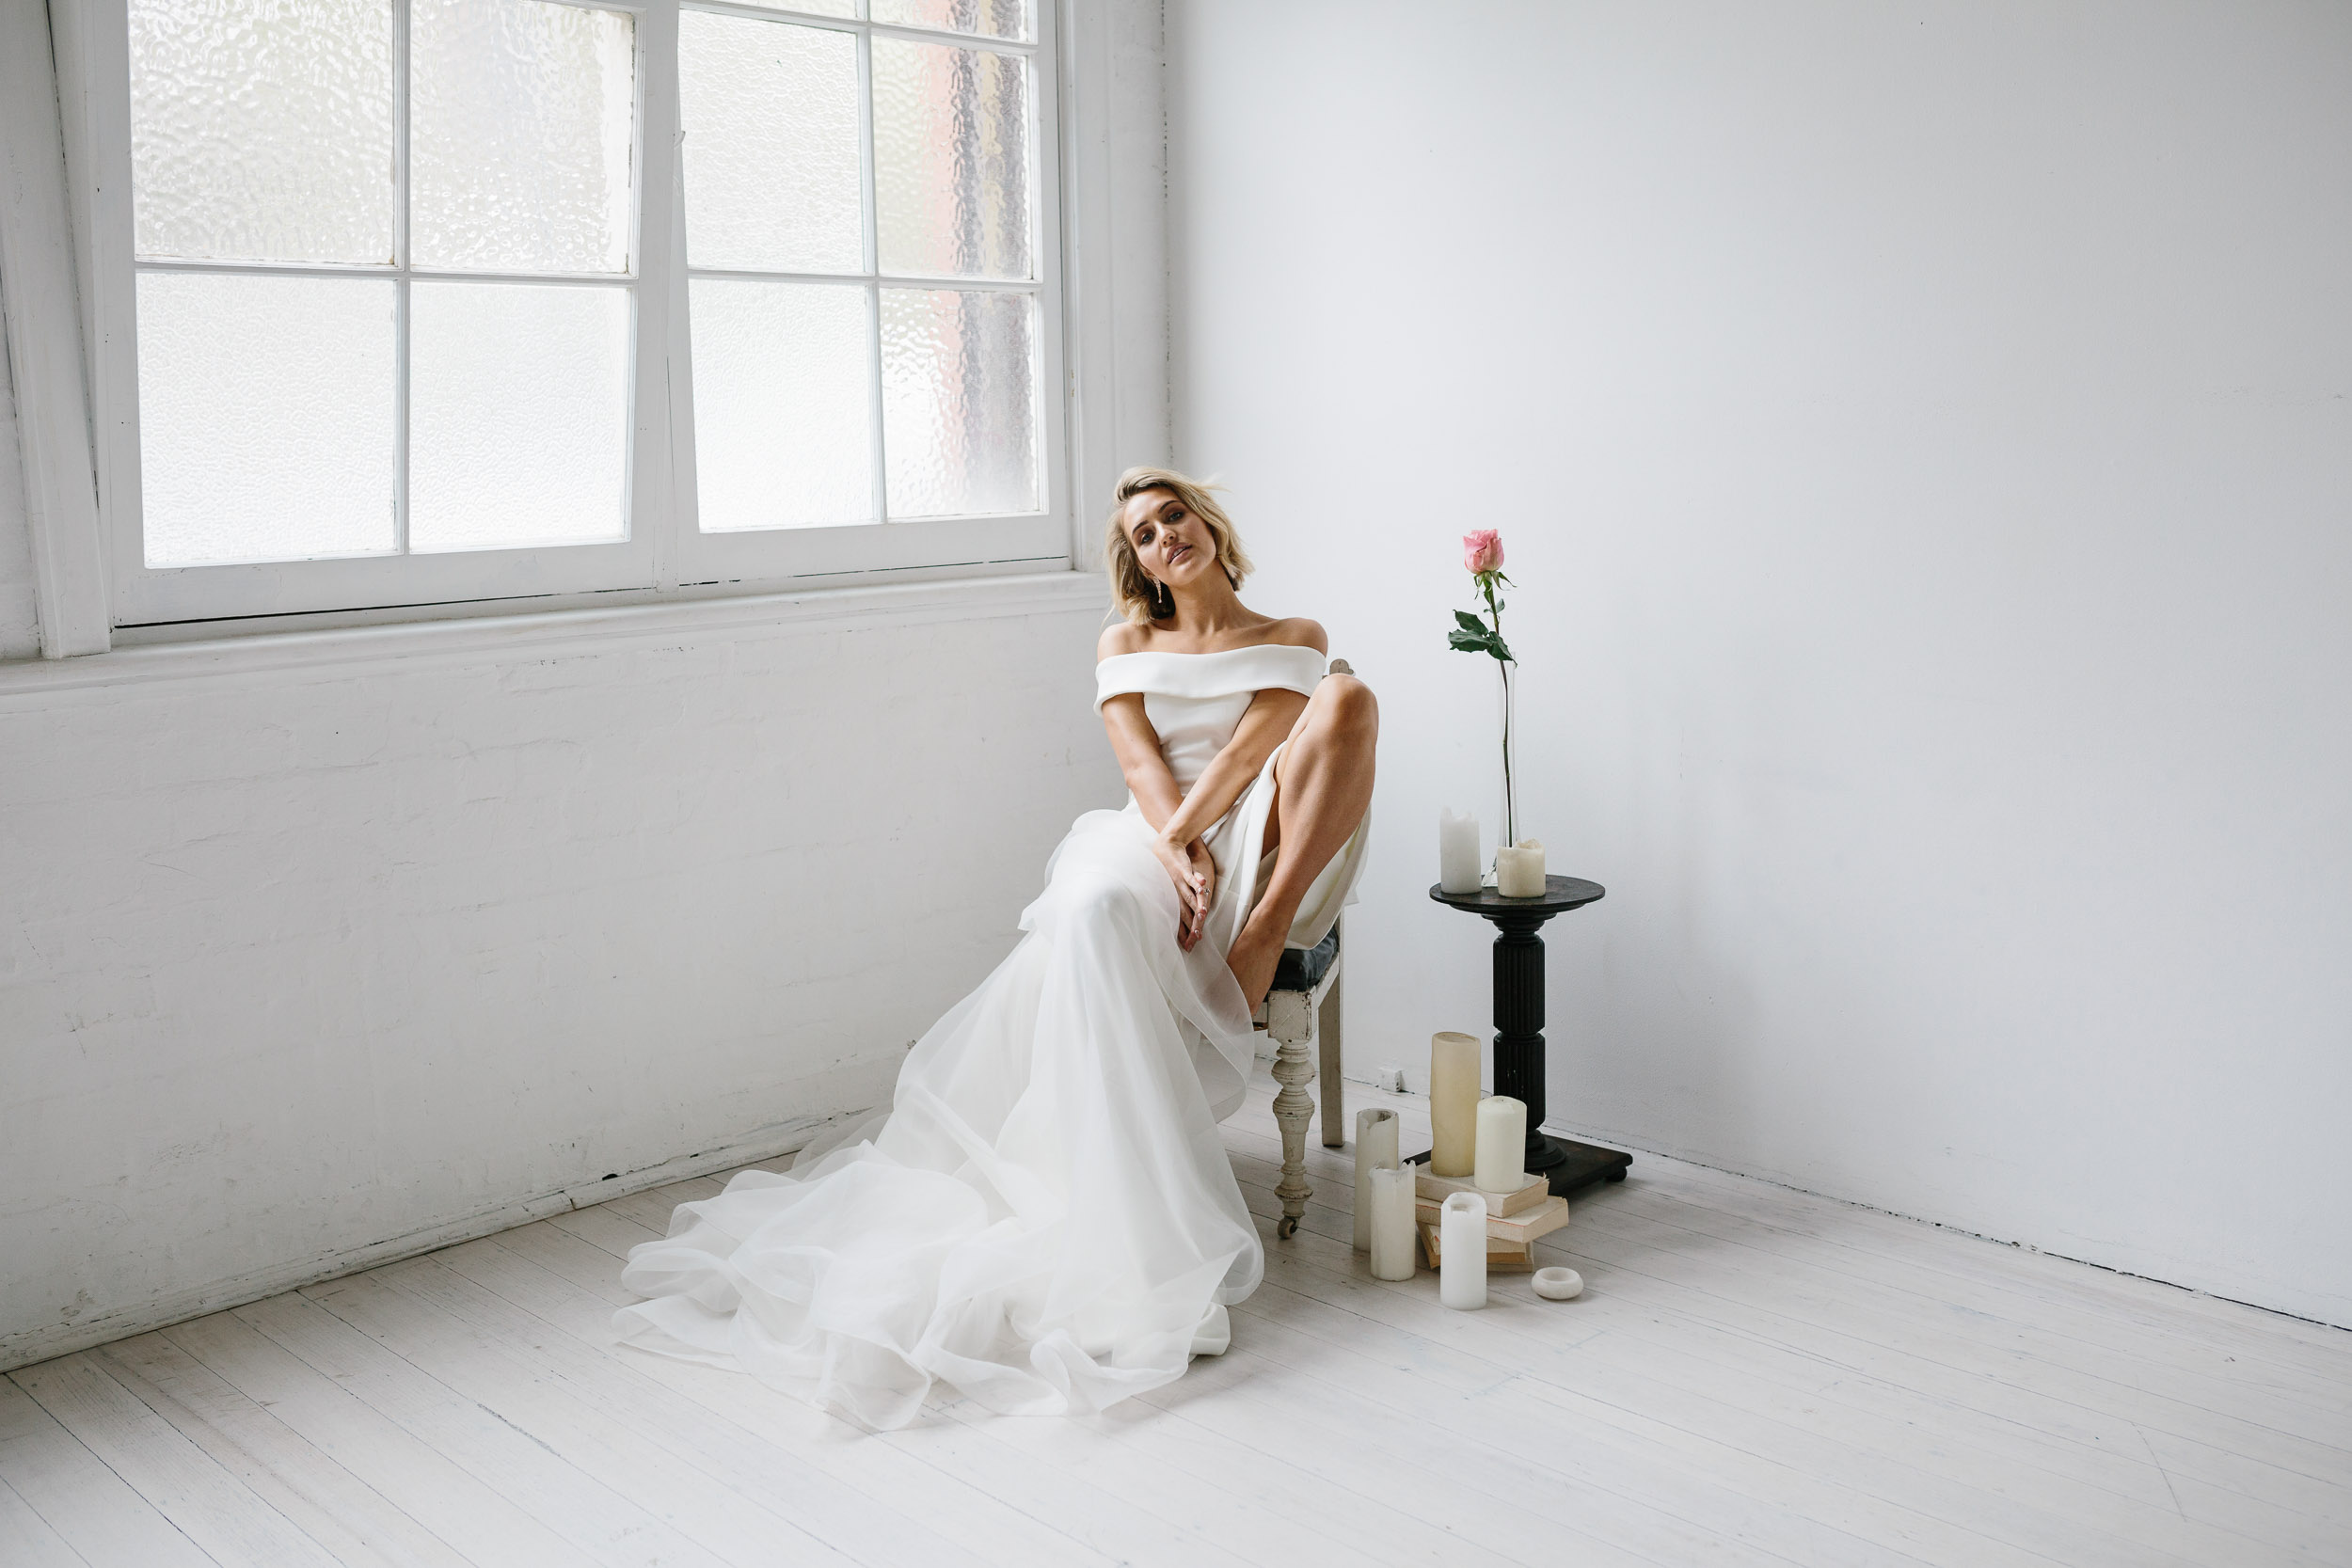 Kas-Richards-Editorial-Photographer-Amelie-George-Bridal-Jewellery-Melbourne-27.jpg